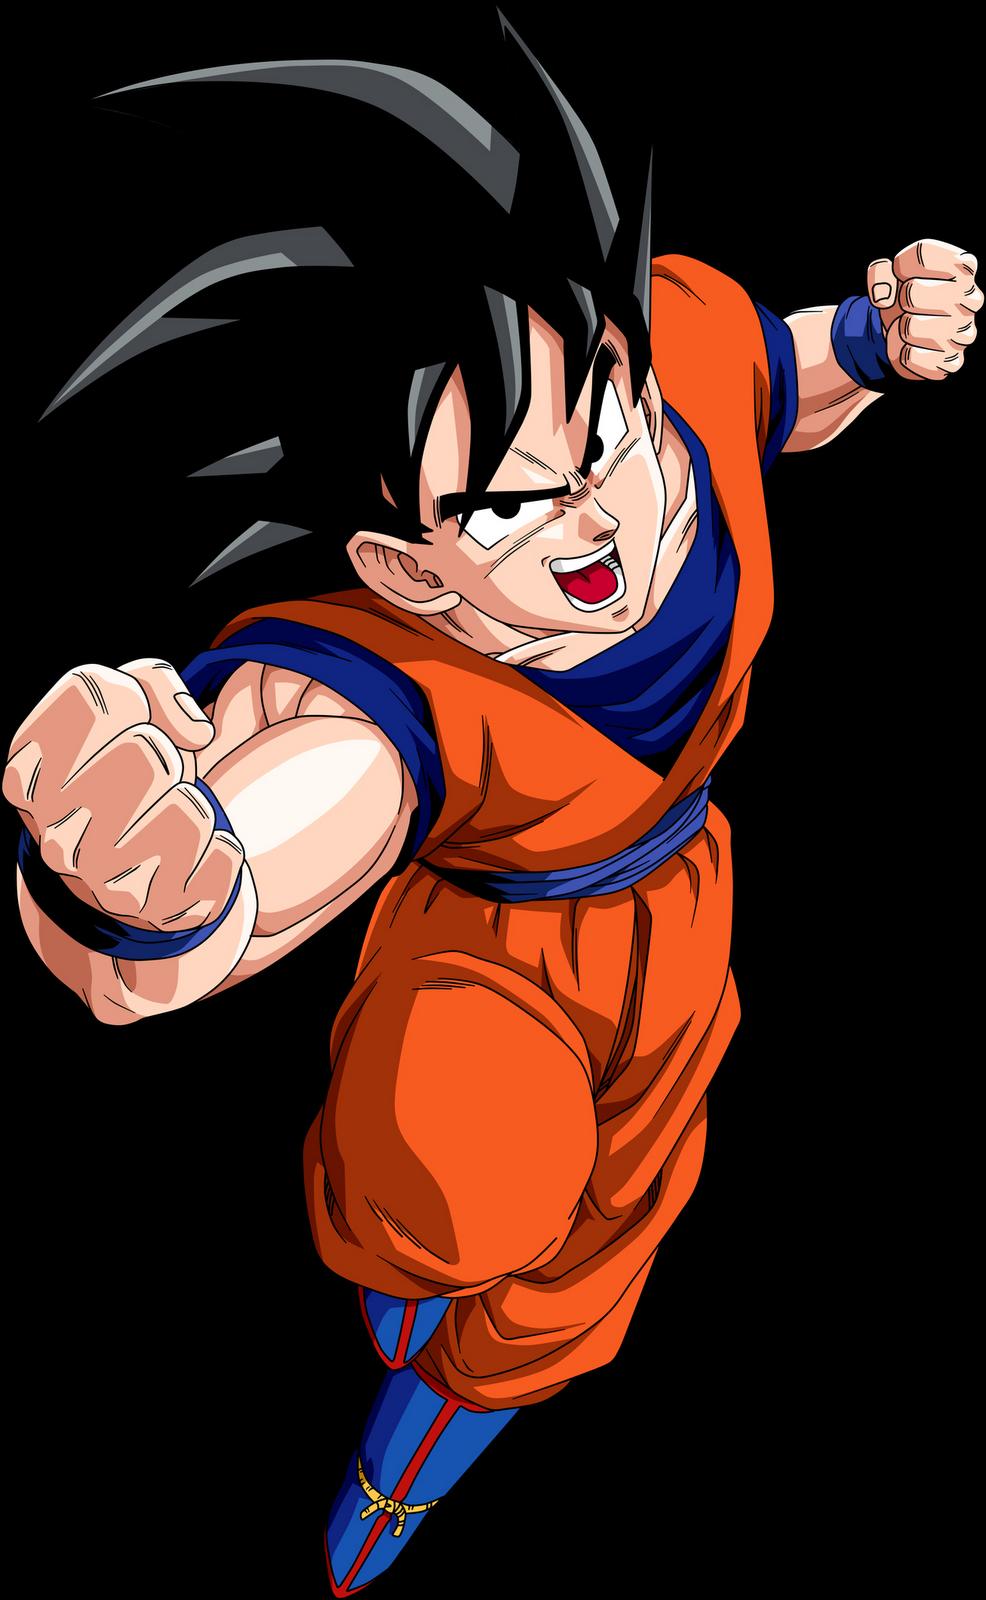 Image - Son Goku.png   Dragonball Fanon Wiki   FANDOM powered by Wikia